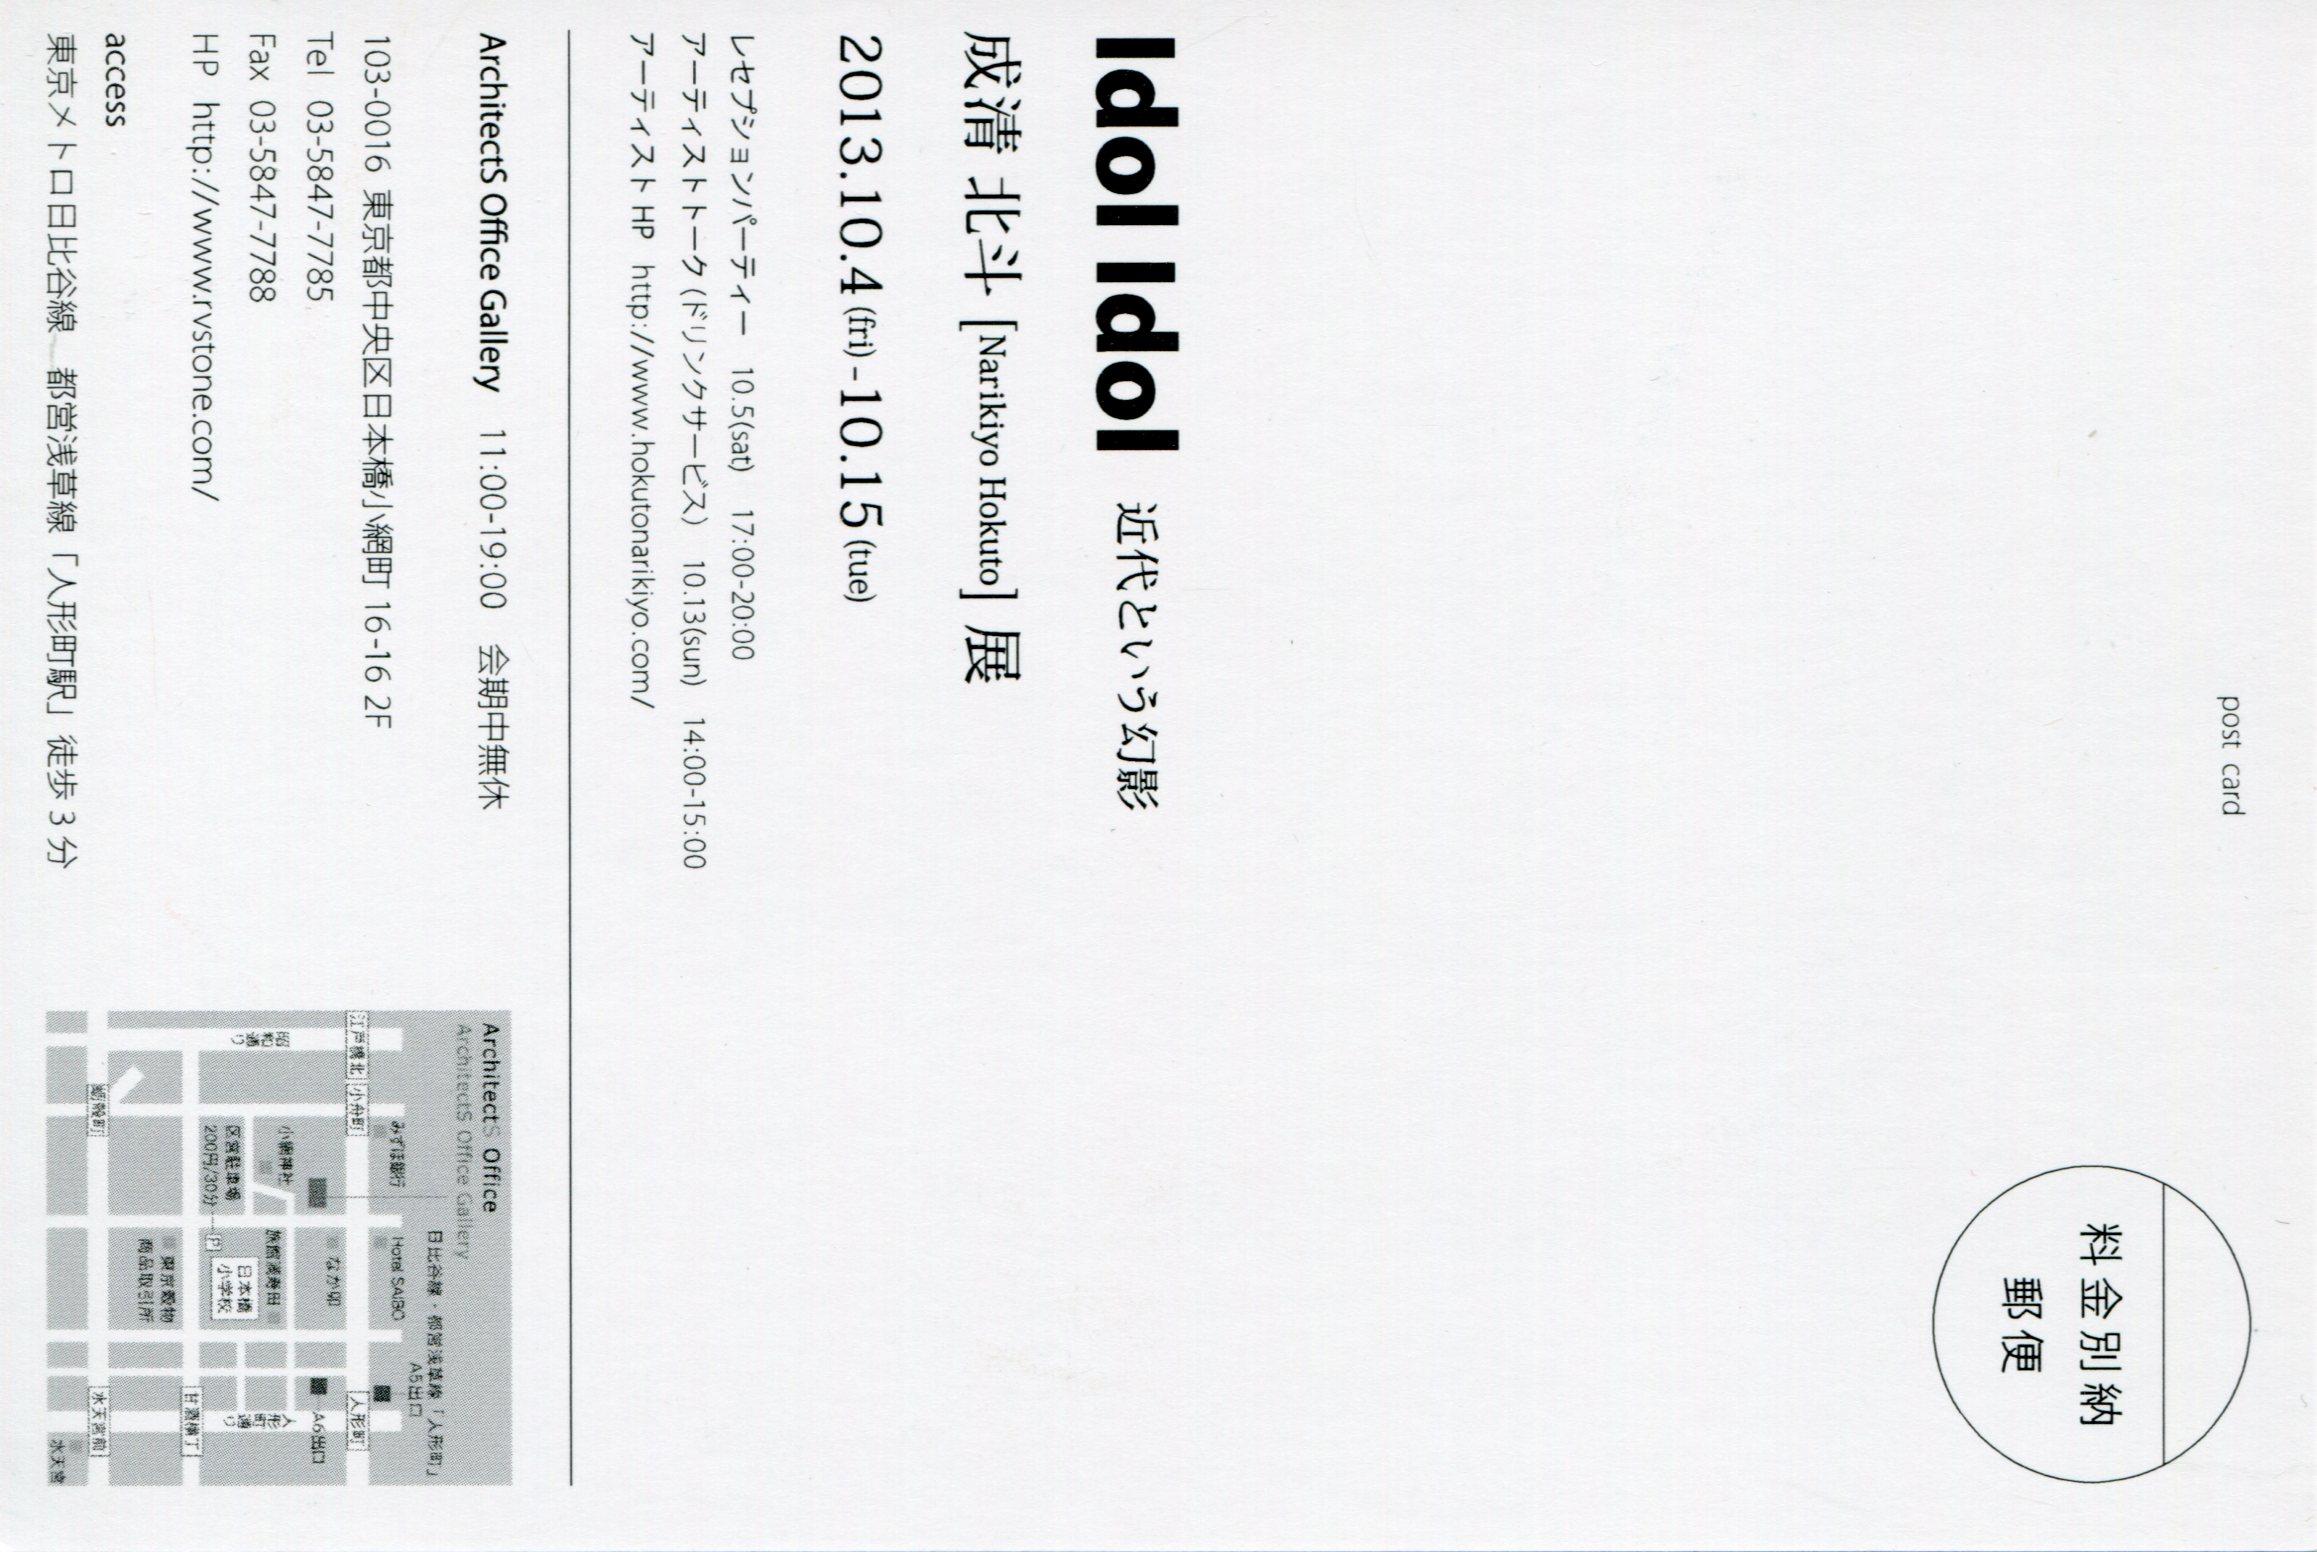 a0258052_20415018.jpg